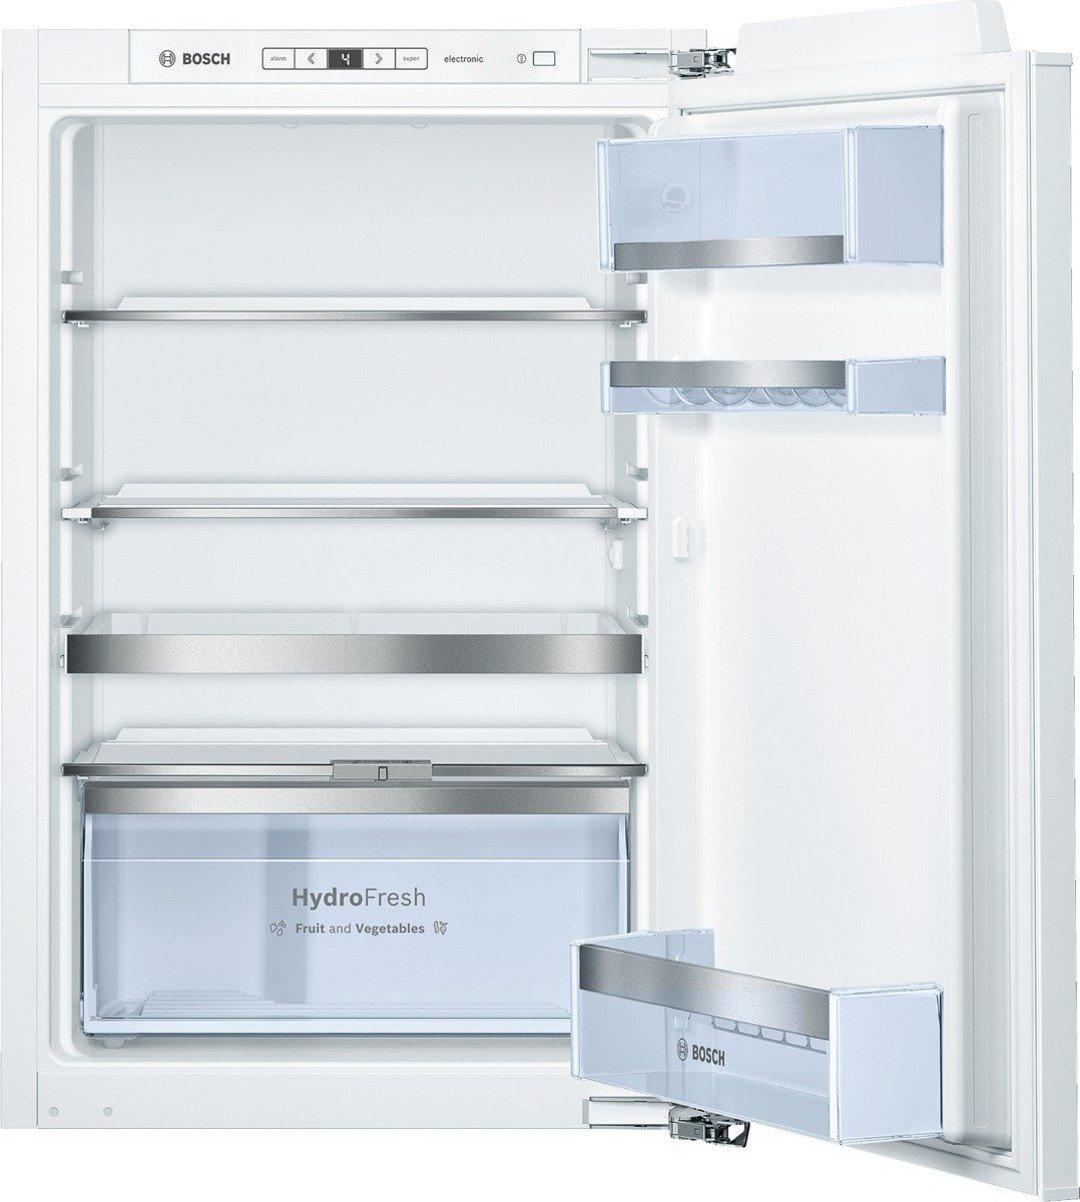 Bosch KIR21AD40 Serie 6 Einbaukühlschrank / A+++ / 87, 4cm Höhe ...